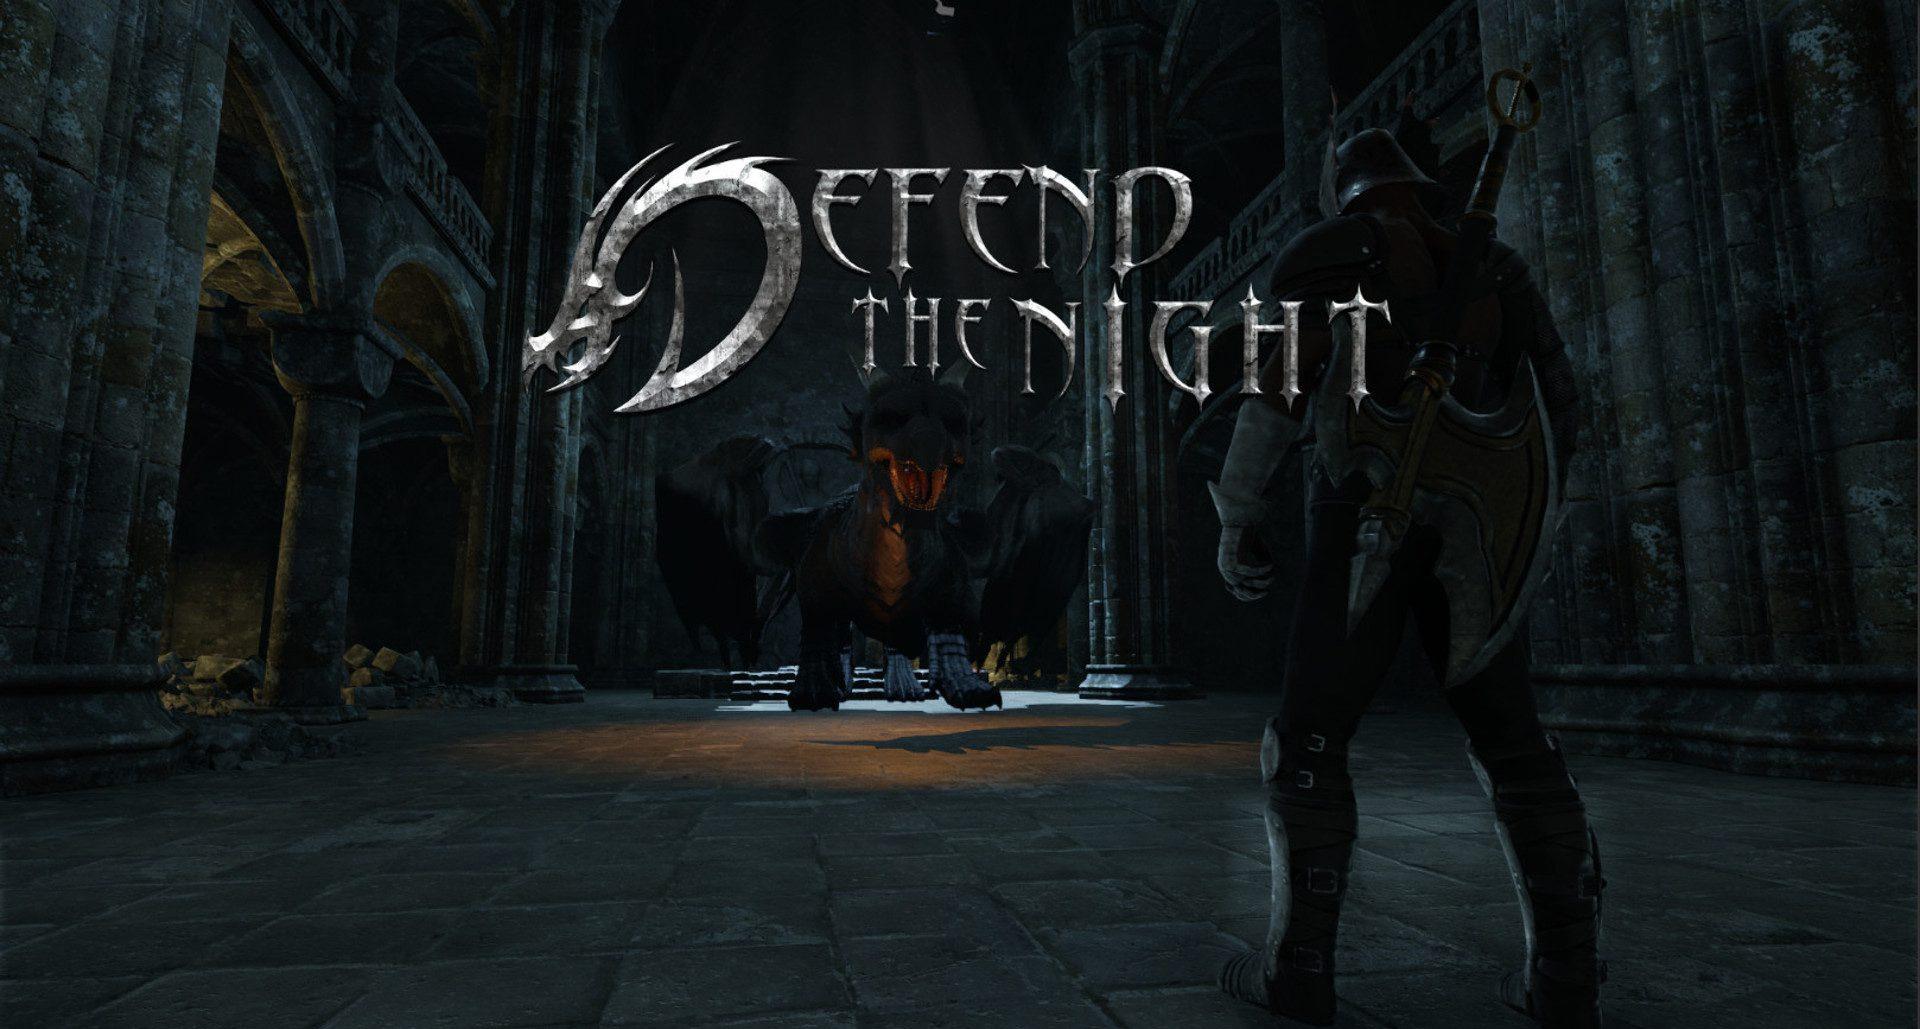 defendthenight1